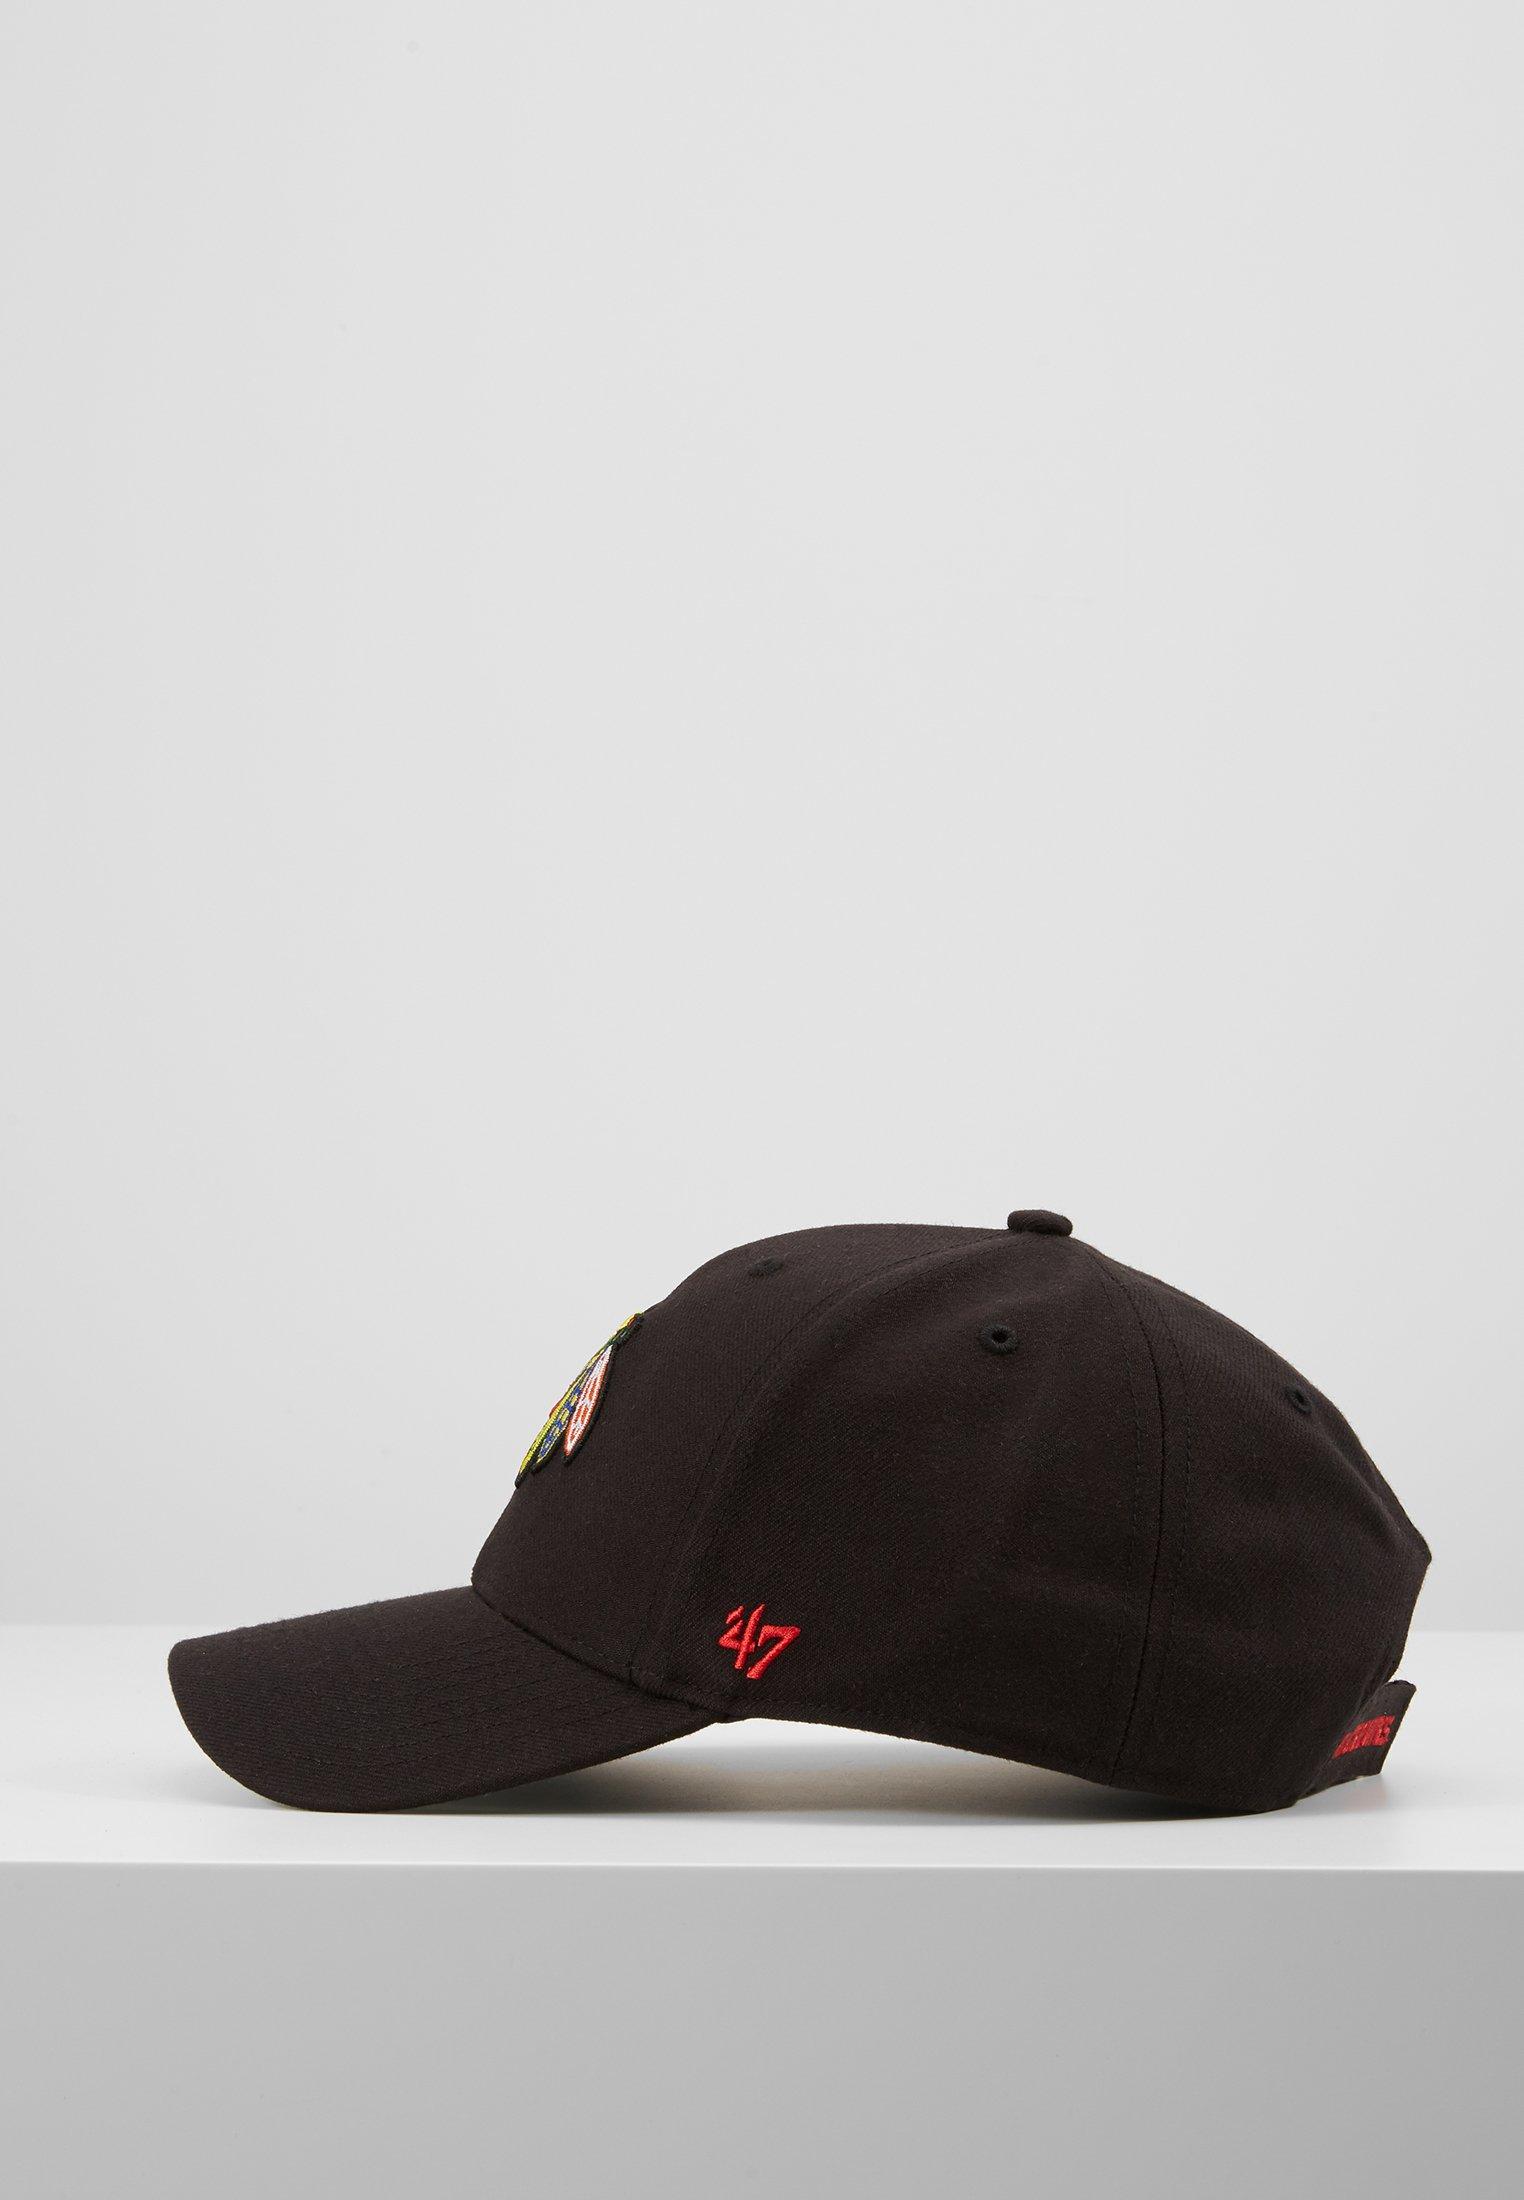 '47 NHL CHICAGO BLACKHAWKS - Cap - black/svart wTdvjV7jgB8vAsR